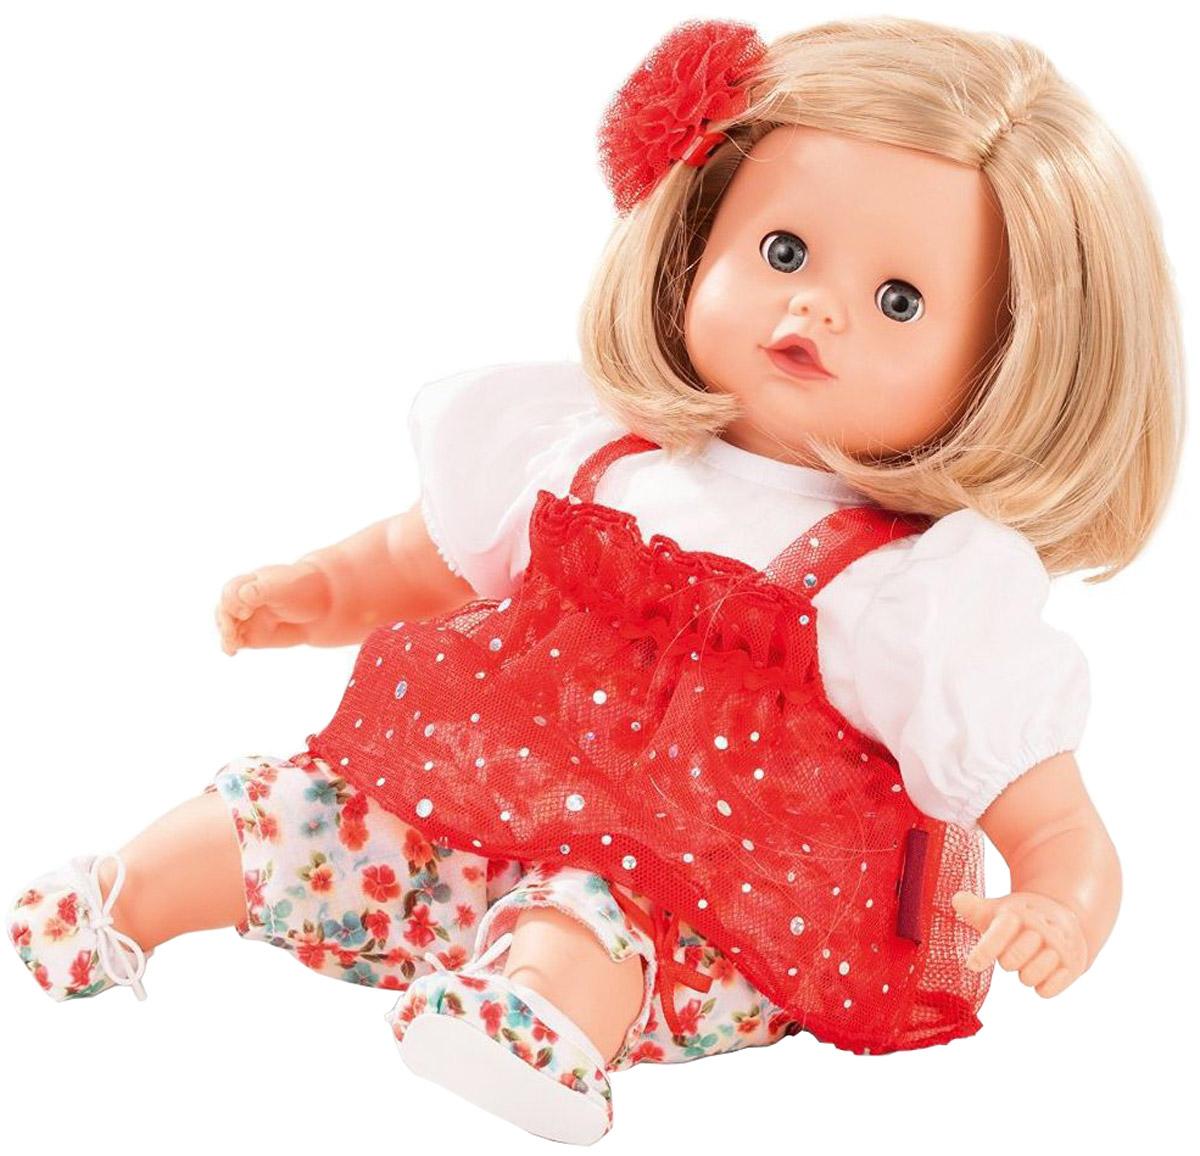 Gotz Кукла Маффин блондинка gotz пупс макси маффин в розовом костюме